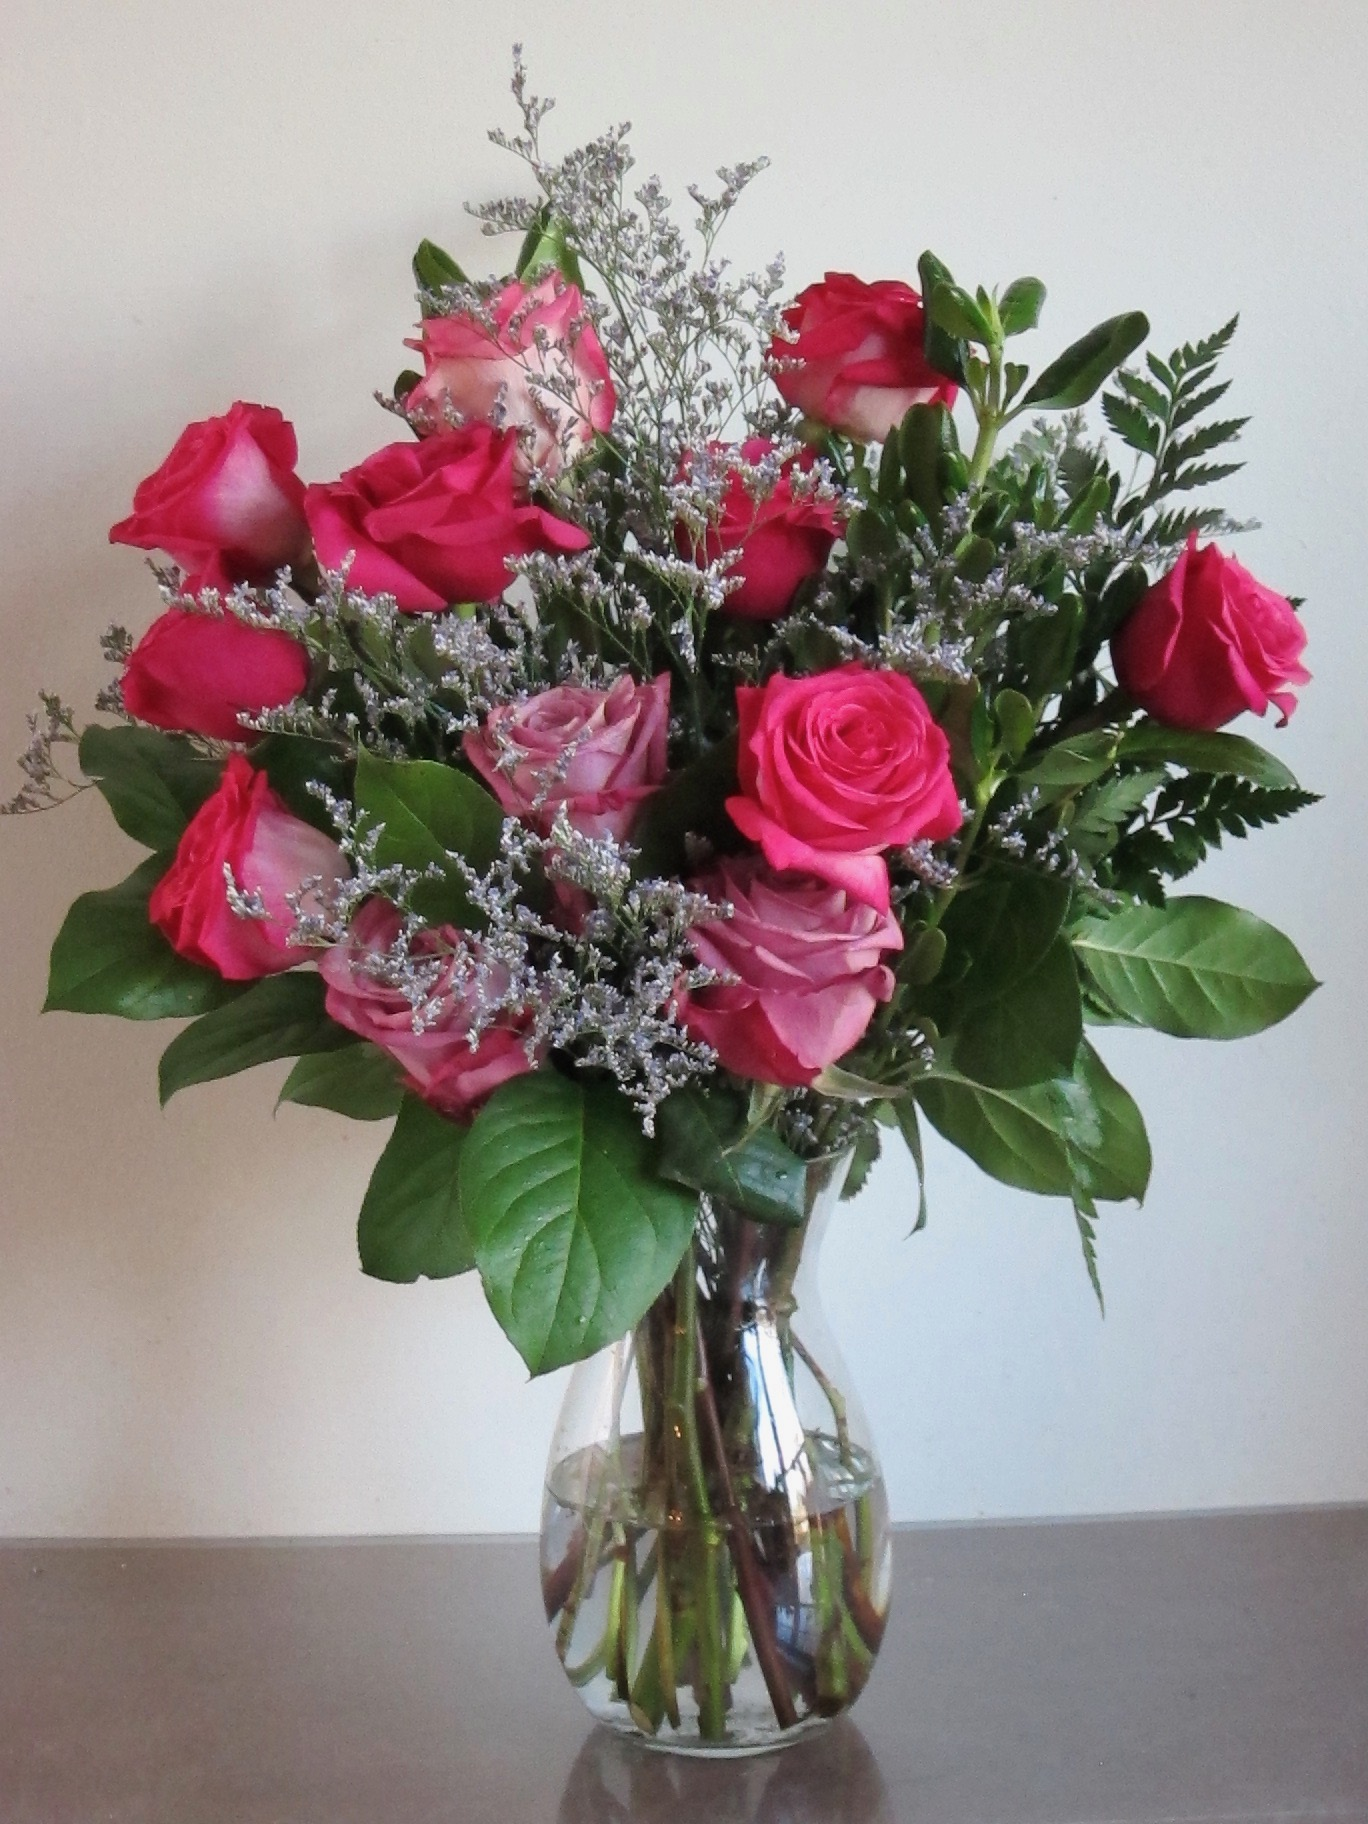 ROSE MEDLEYS    Roses accented with seasonal picks: half dozen, $50, twelve for $75, eighteen for $95.